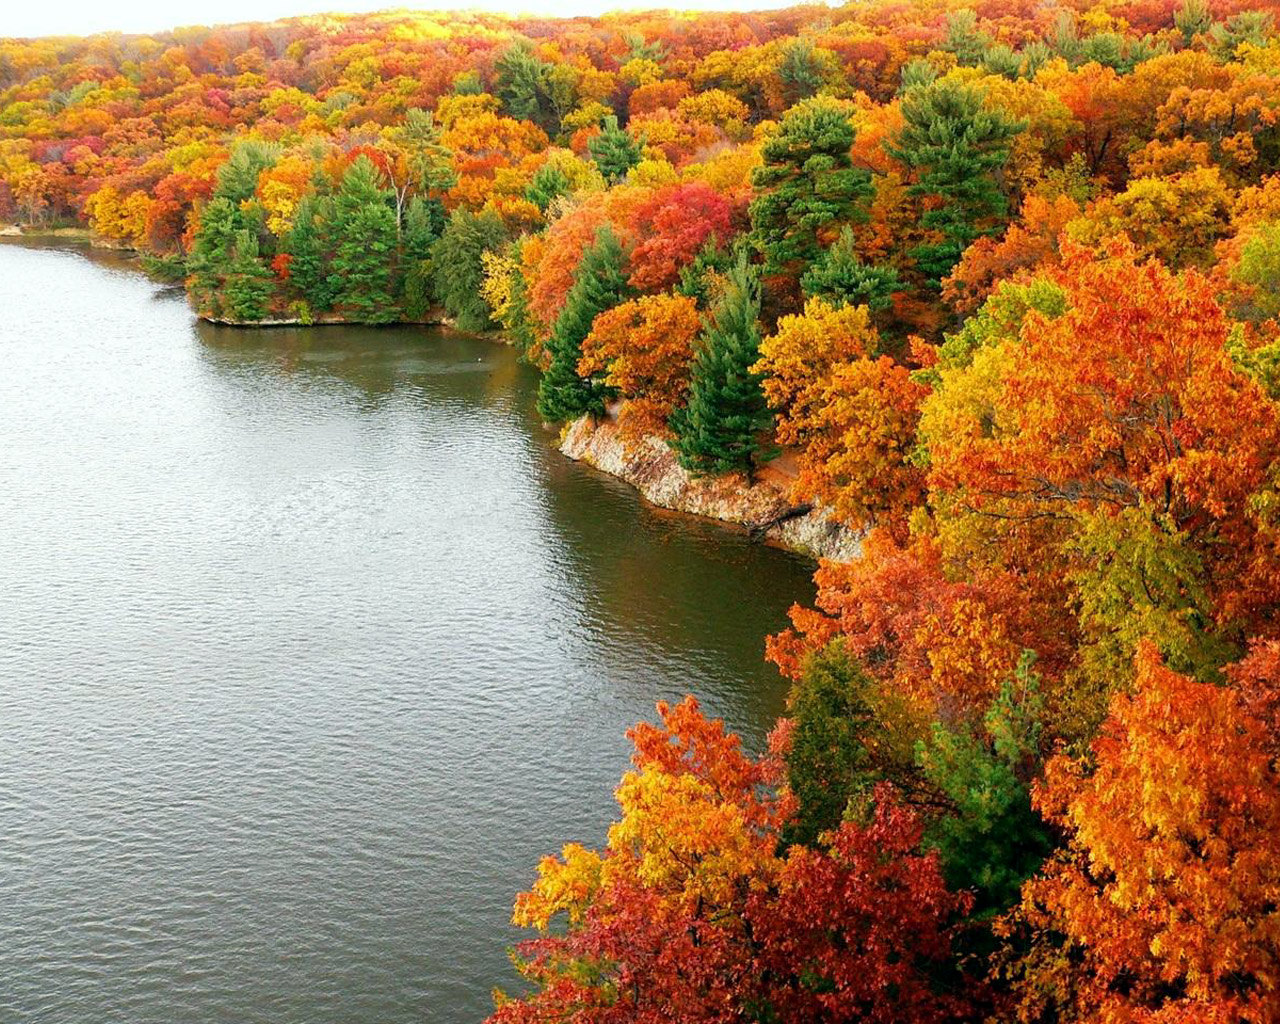 http://3.bp.blogspot.com/-Tw39kQAZFCc/TqFd7MayA7I/AAAAAAAAA-U/O9UvQ5Q0YaY/s1600/cool-autumn-wallpaper.jpg